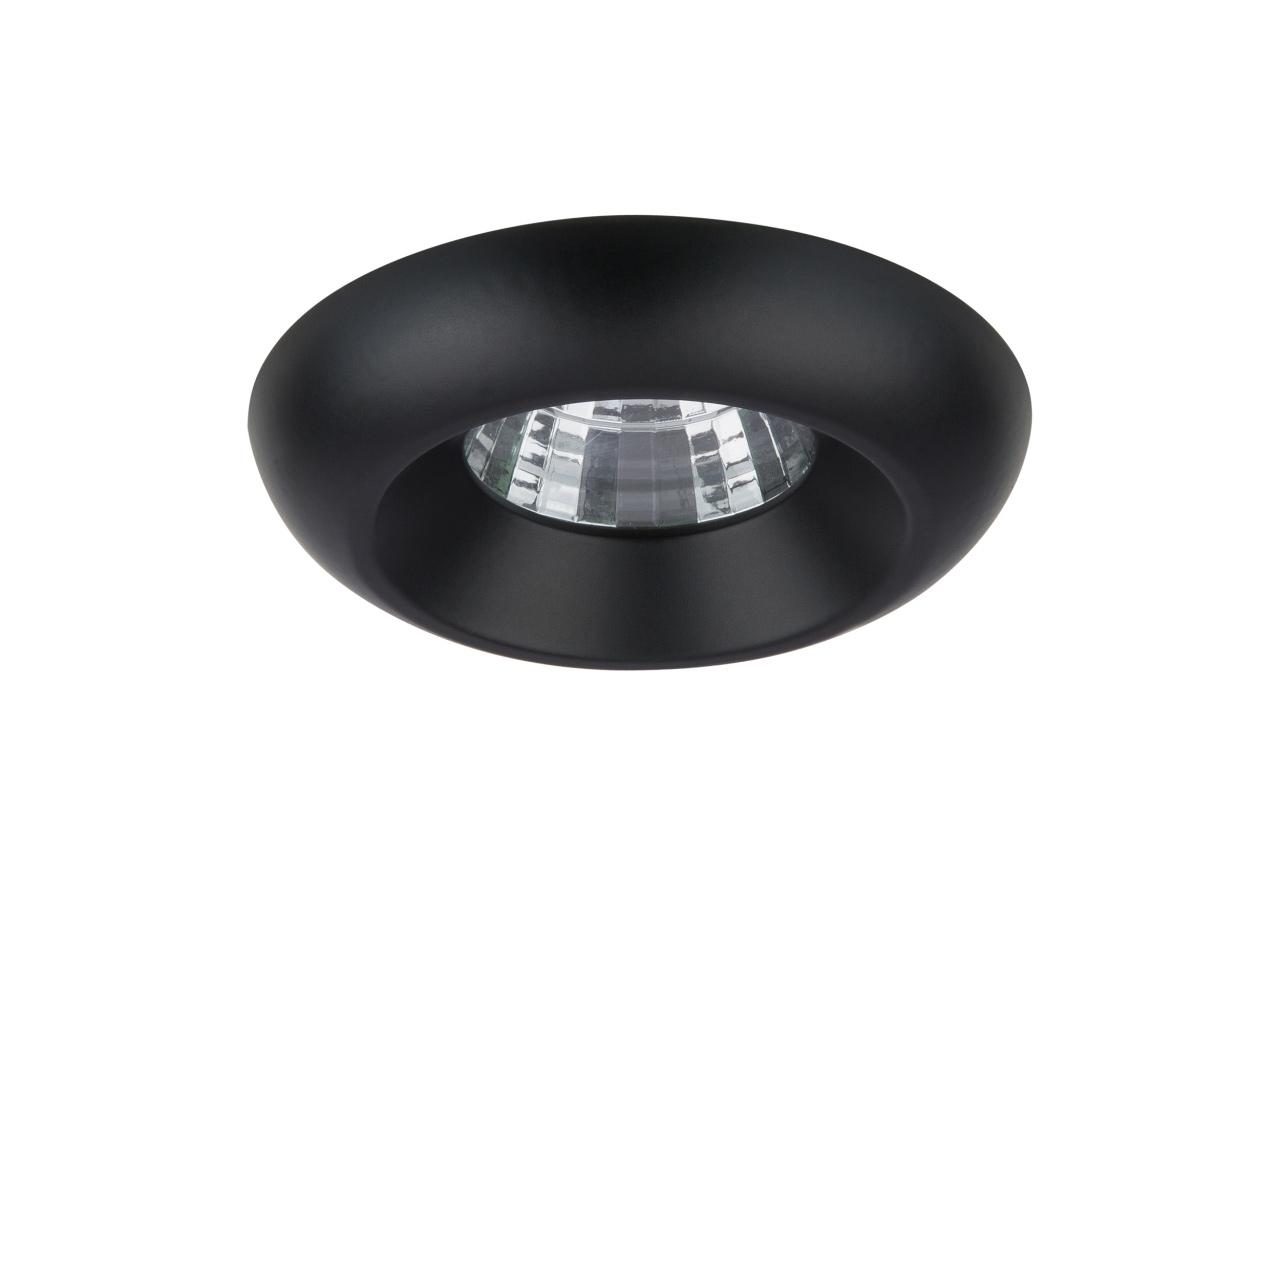 Светильник Monde LED 5W 400LM 50G черный 3000K Lightstar 071057